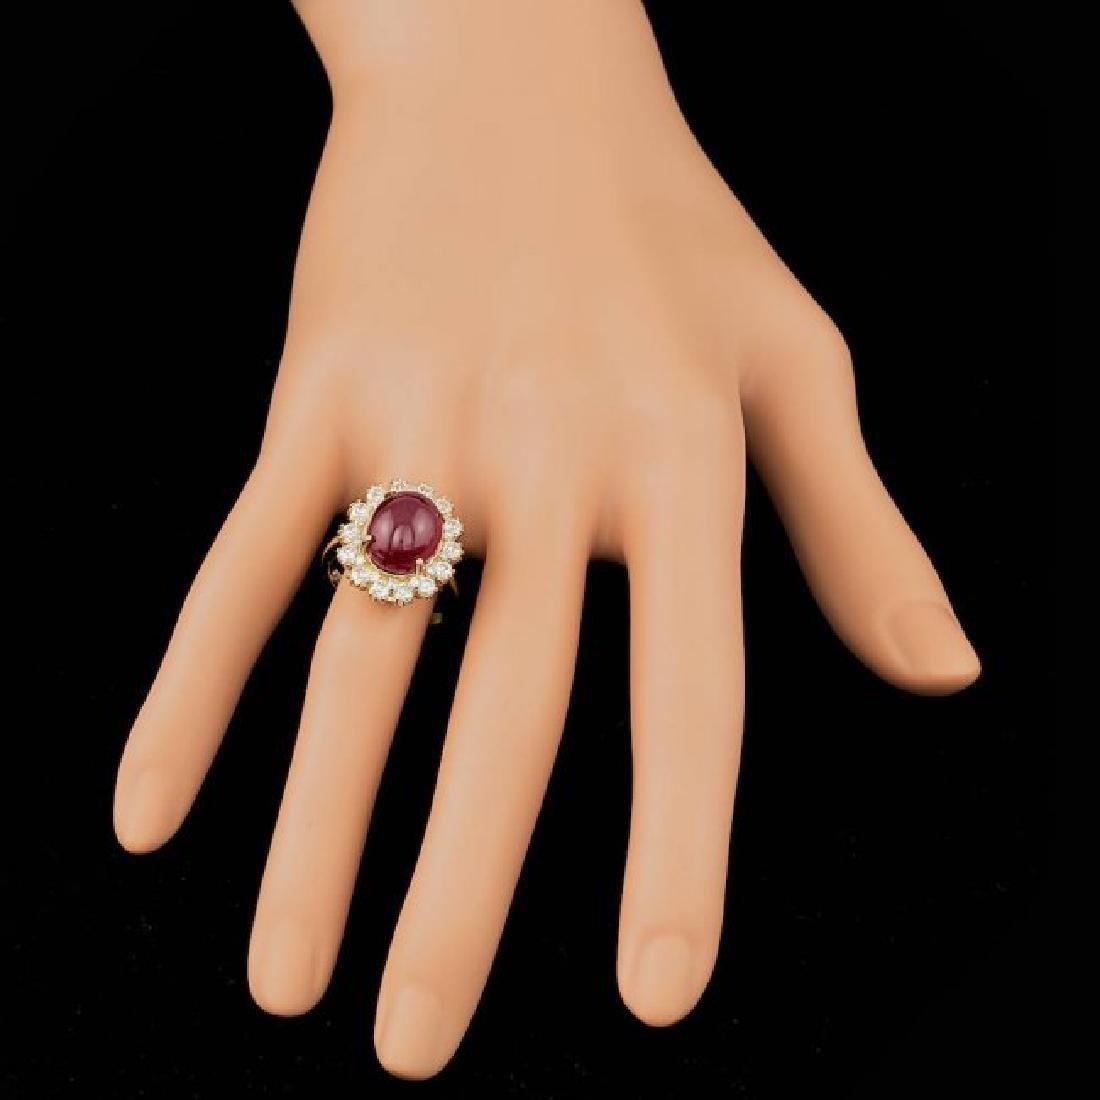 14k Yellow Gold 9.50ct Ruby 1.40ct Diamond Ring - 4